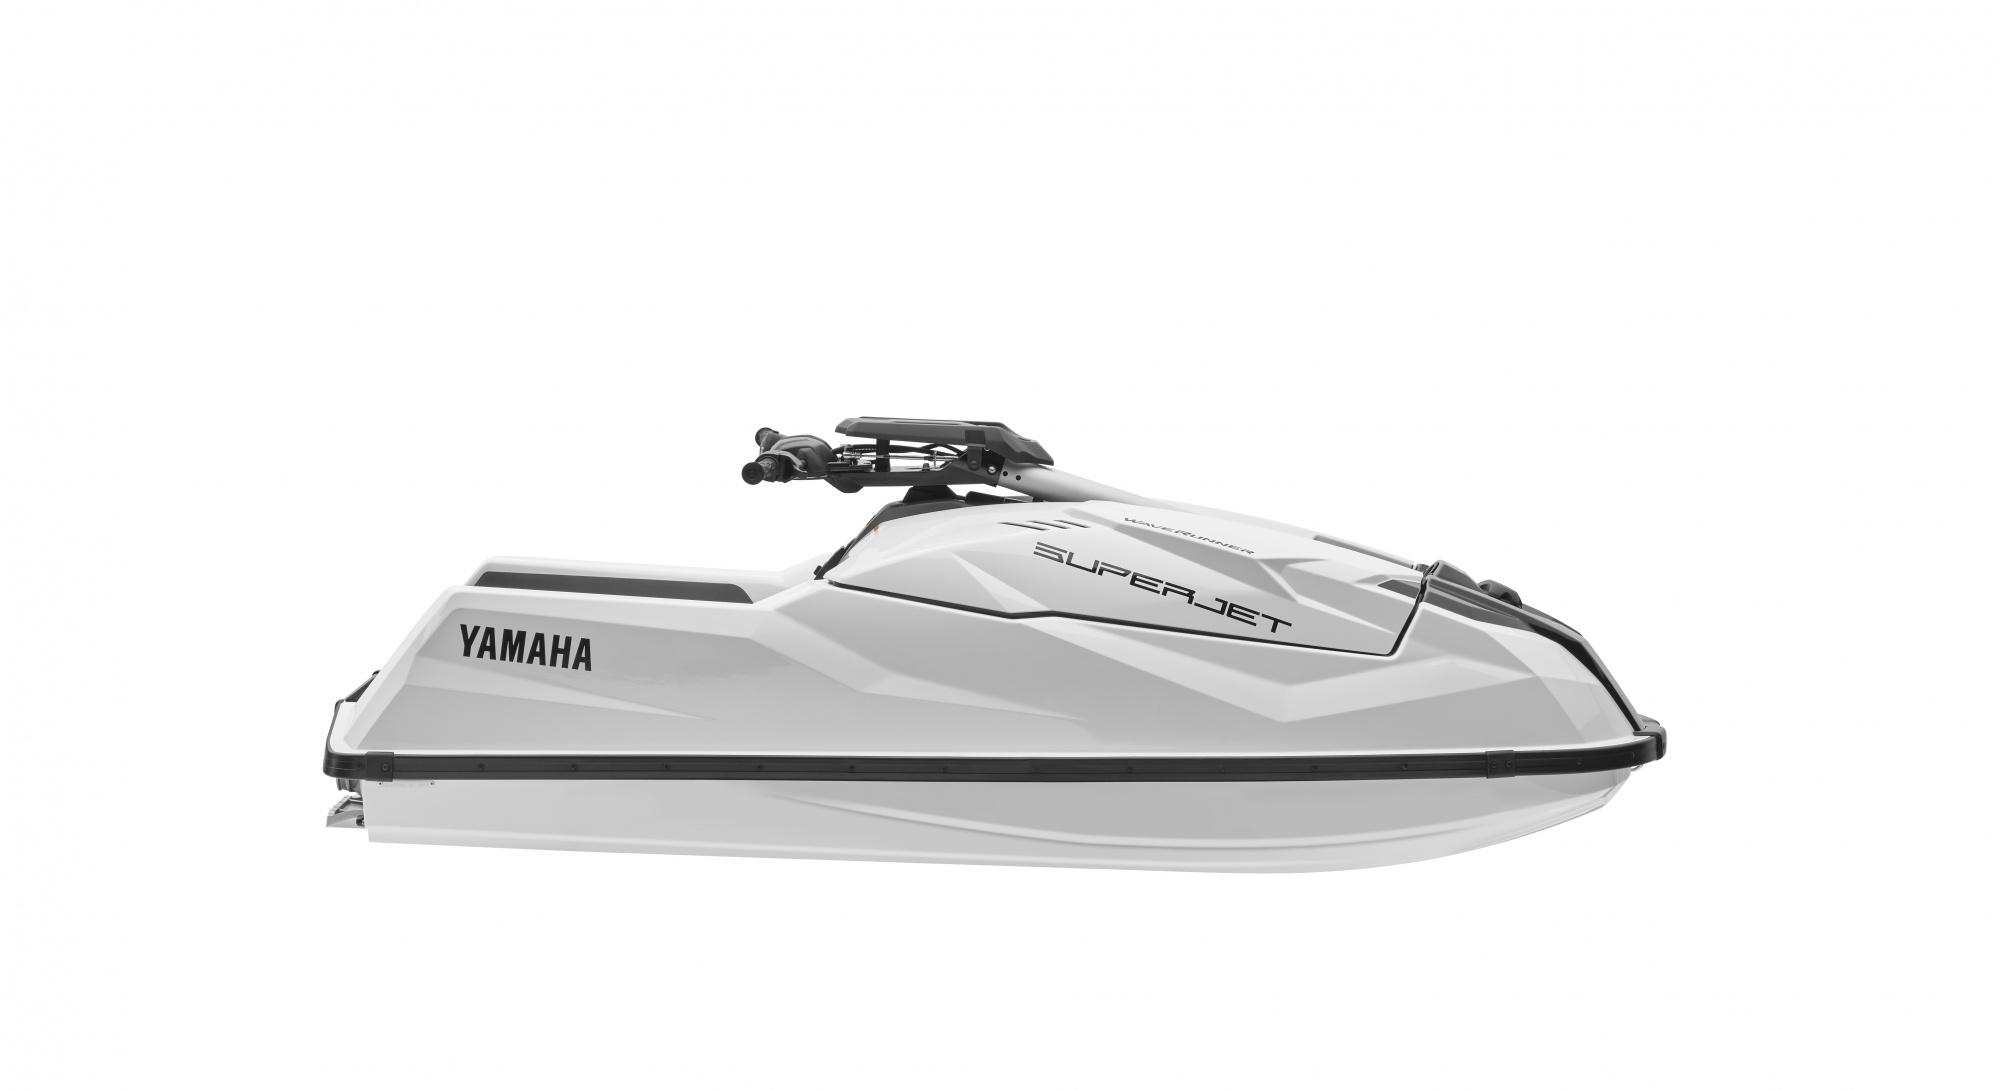 Yamaha superjet - 2021_Superjet_White_1